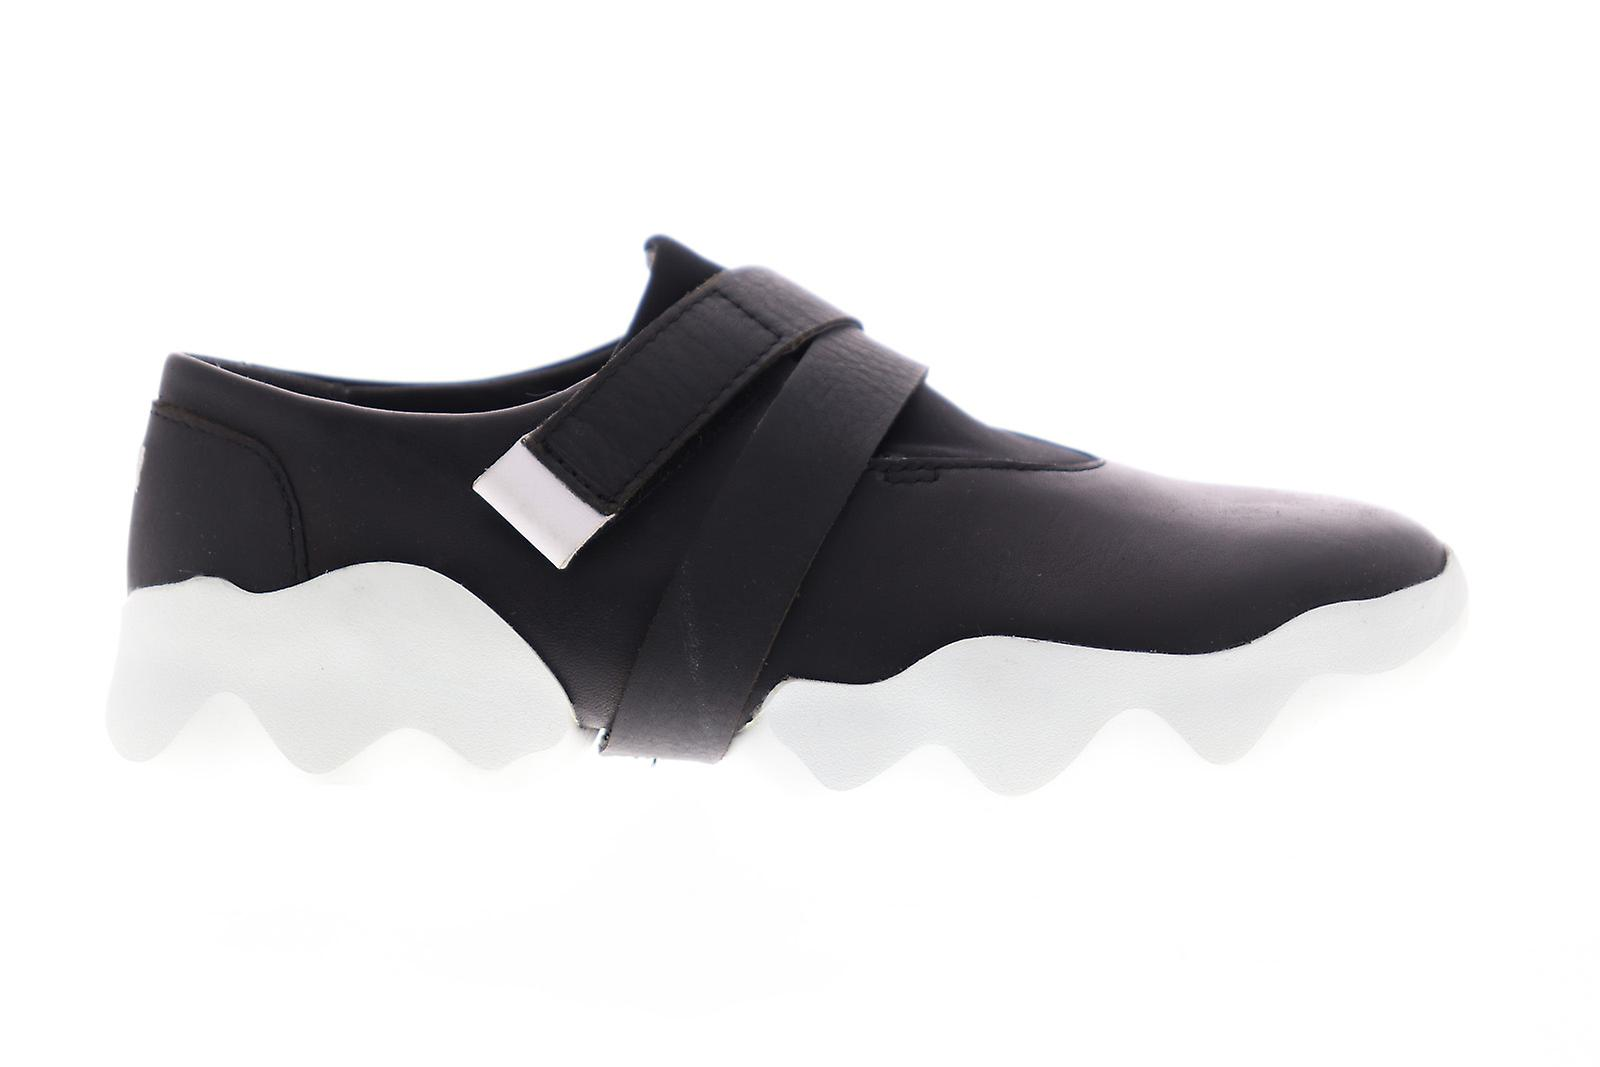 Camper Dub Femmes Black Leather Slip On Flats Mocakers Chaussures